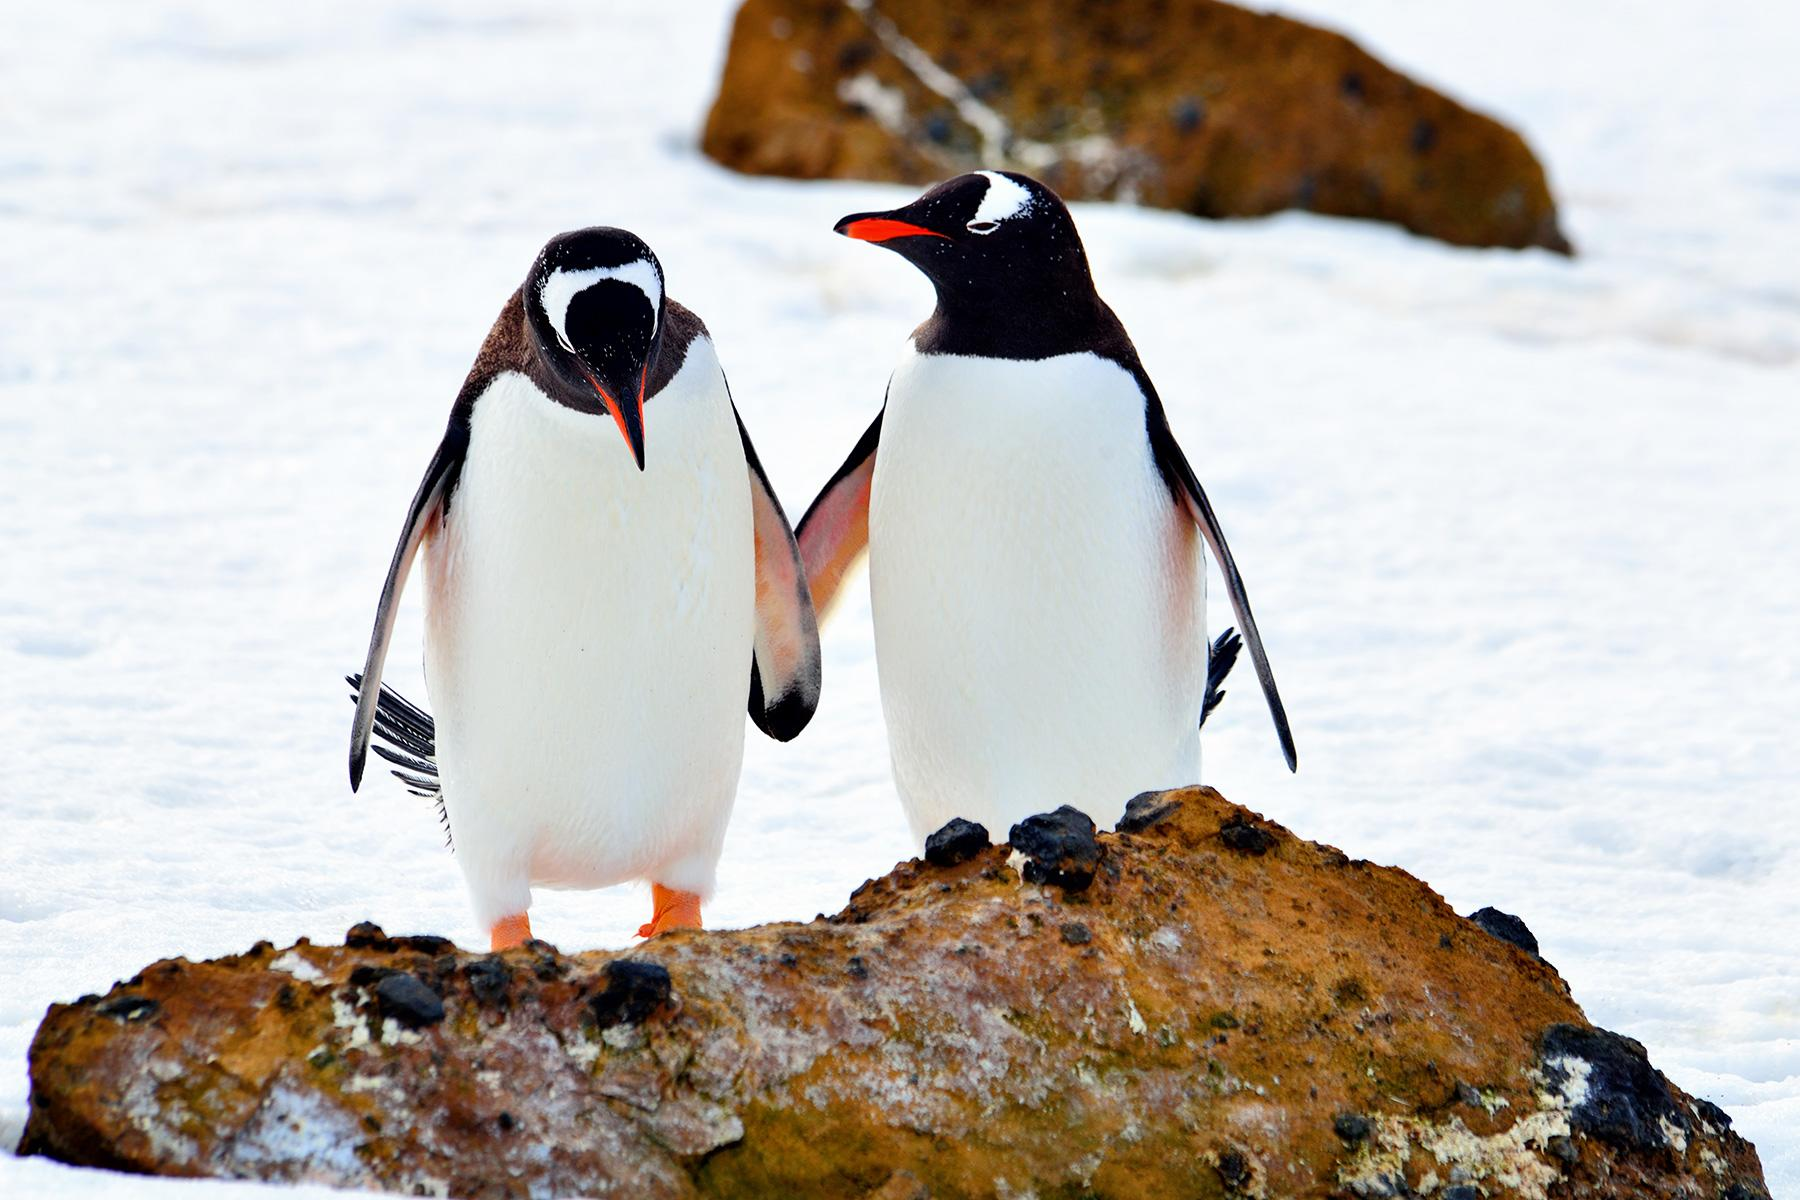 12_Antartica101_NeverTirePenguins_shutterstock_609598490_2